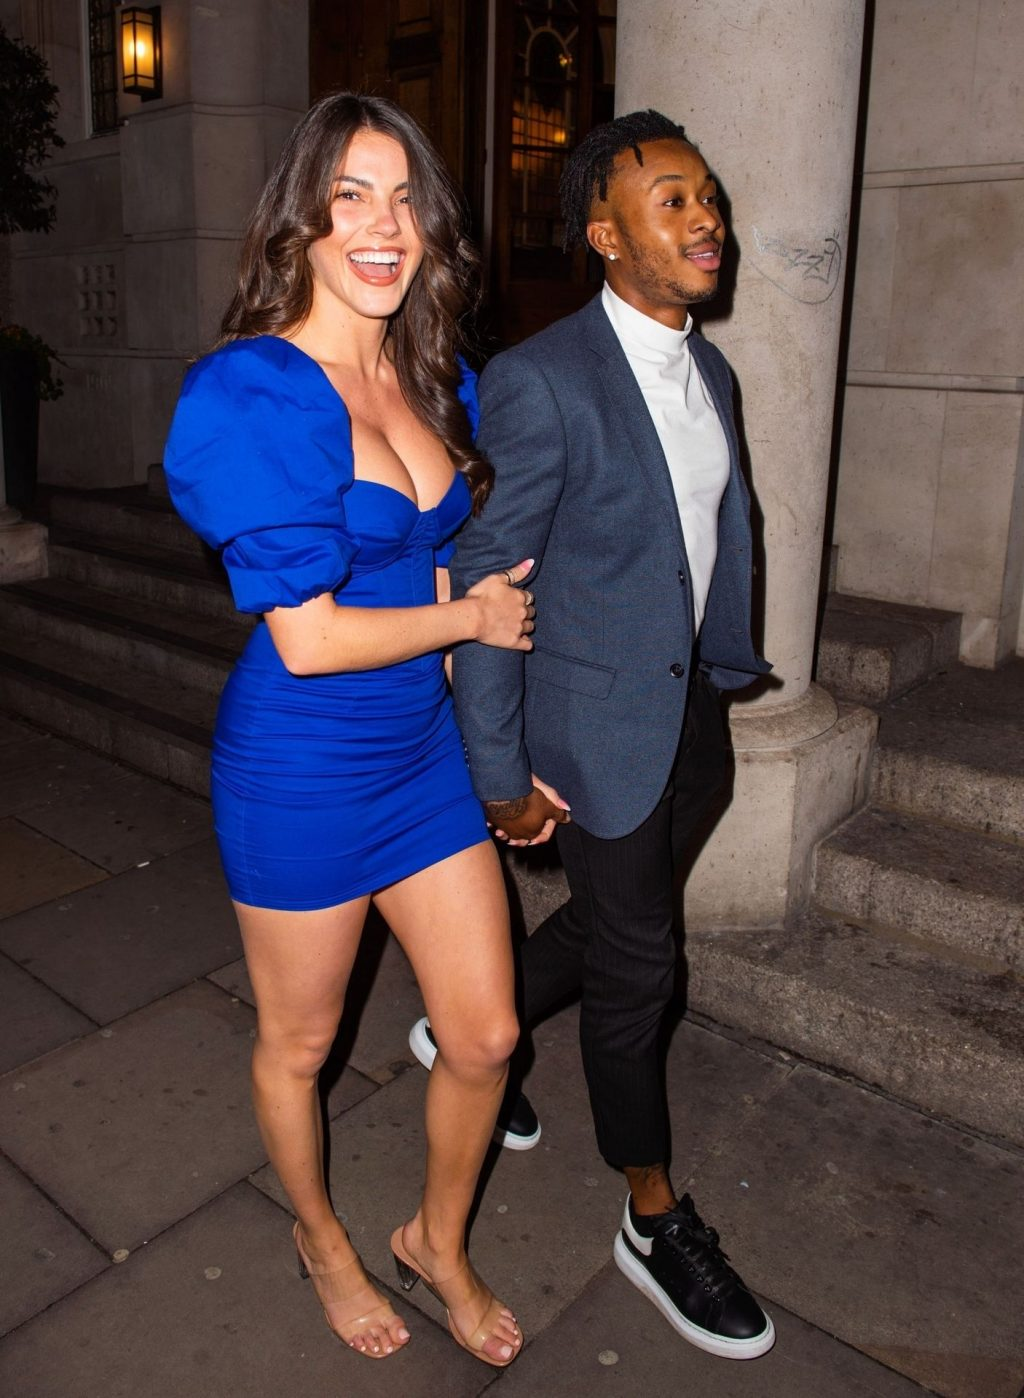 Rebecca Gormley & Biggs Chris Are Seen Heading to Rosso in Manchester (13 Photos)